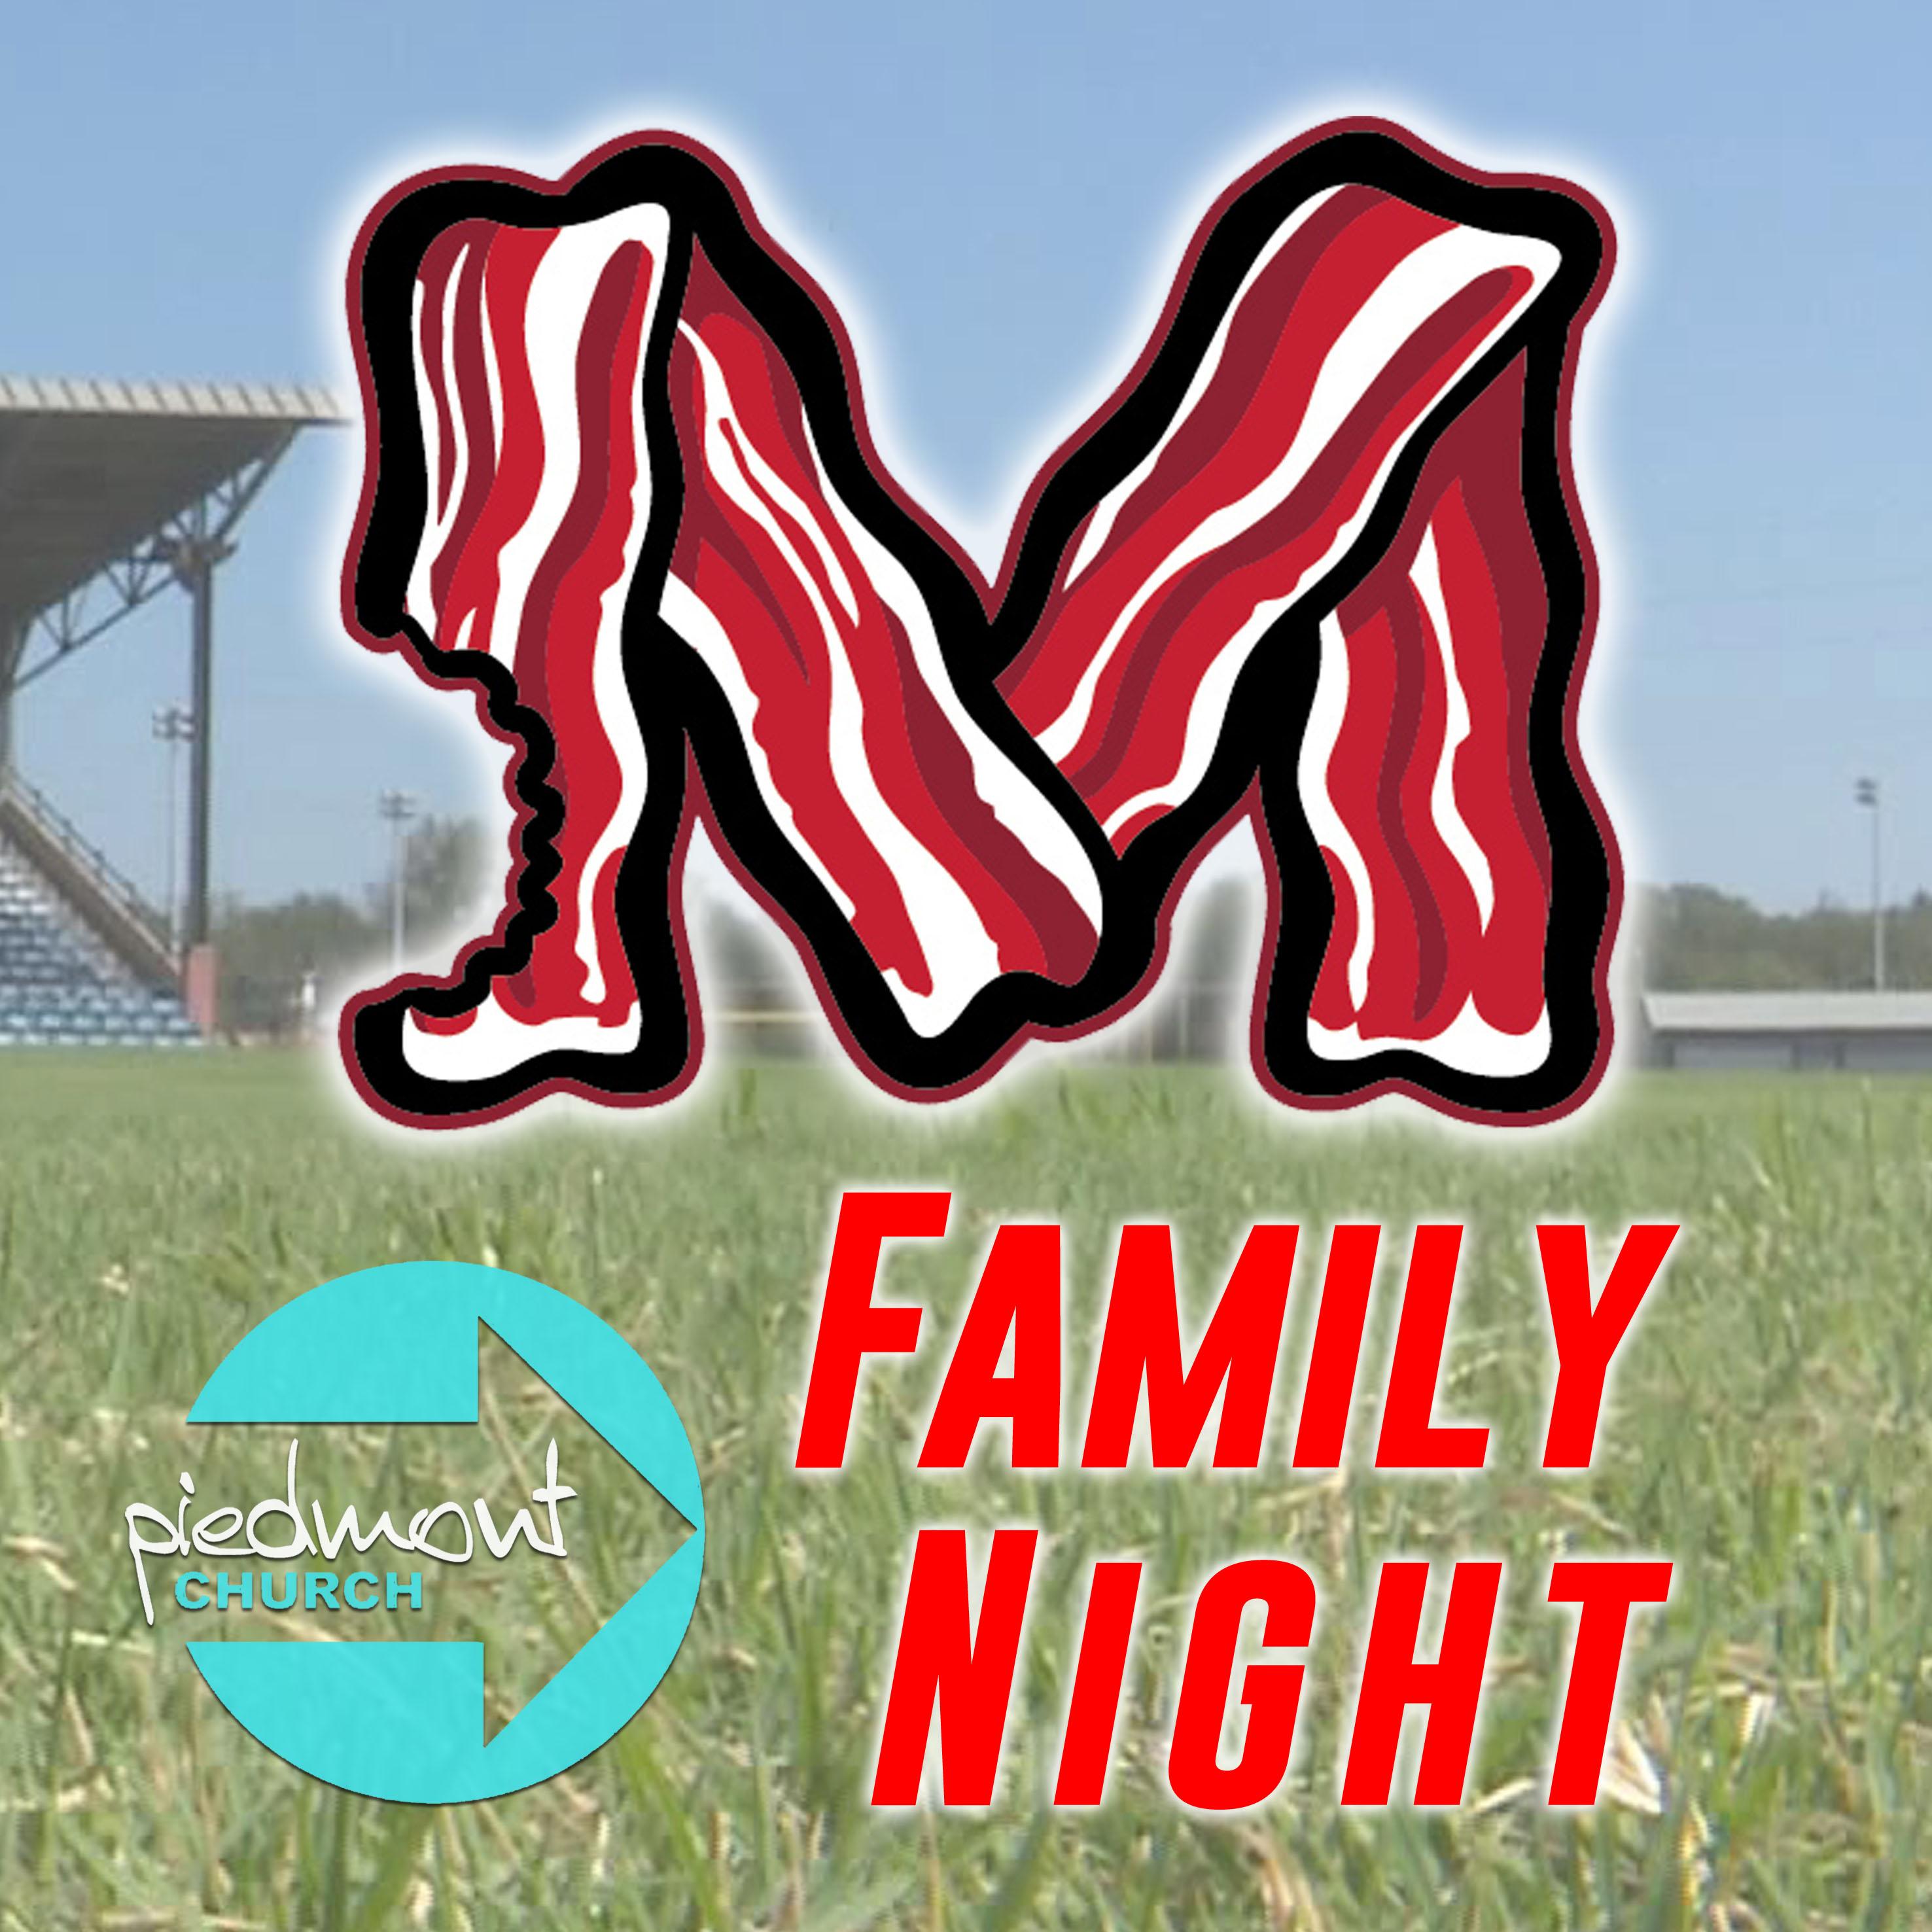 Fam night macon bacon logo